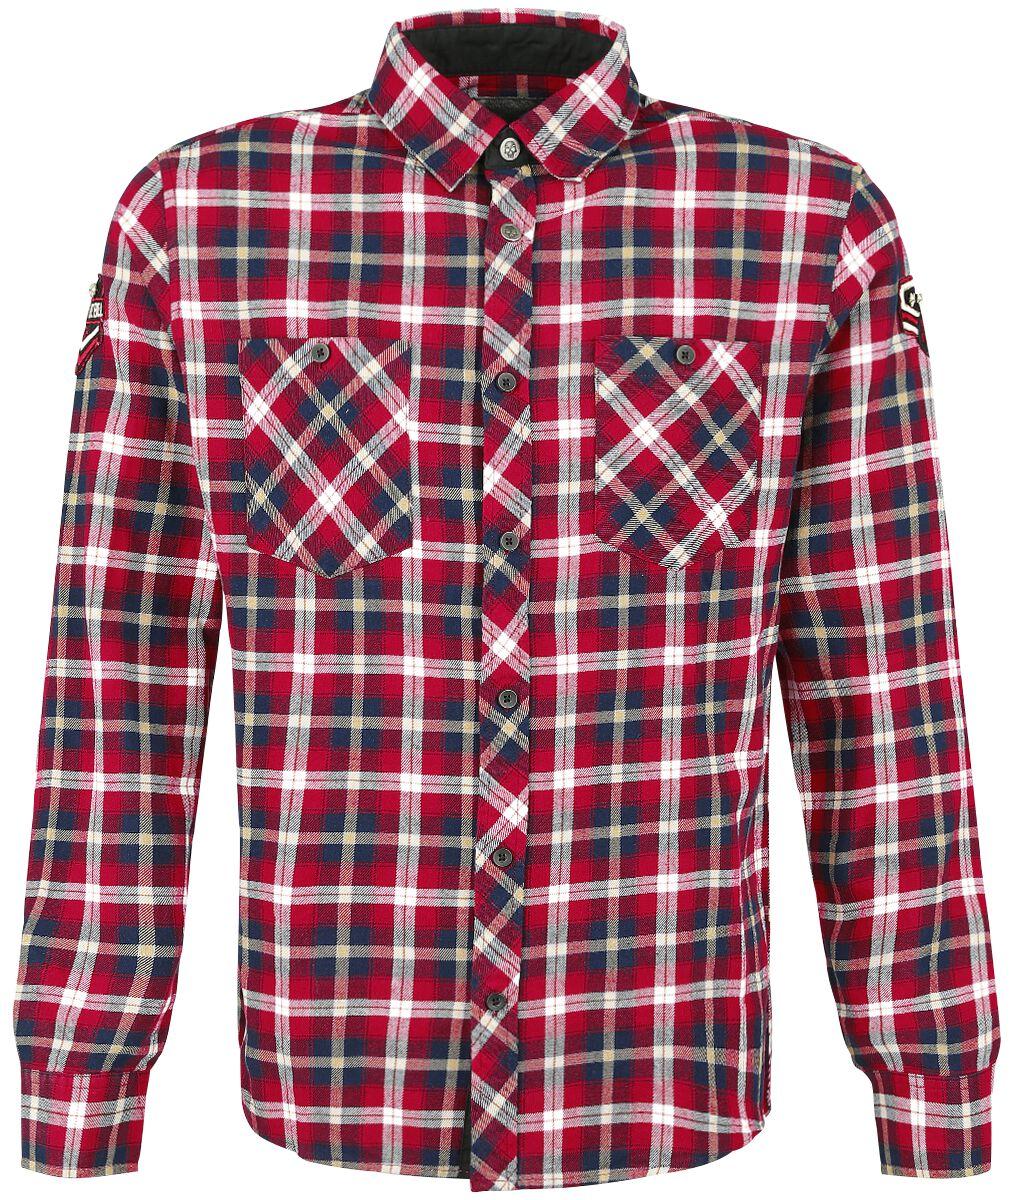 Image of   Rock Rebel by EMP Checkered Embroidery Shirt Skjorte rød-sort